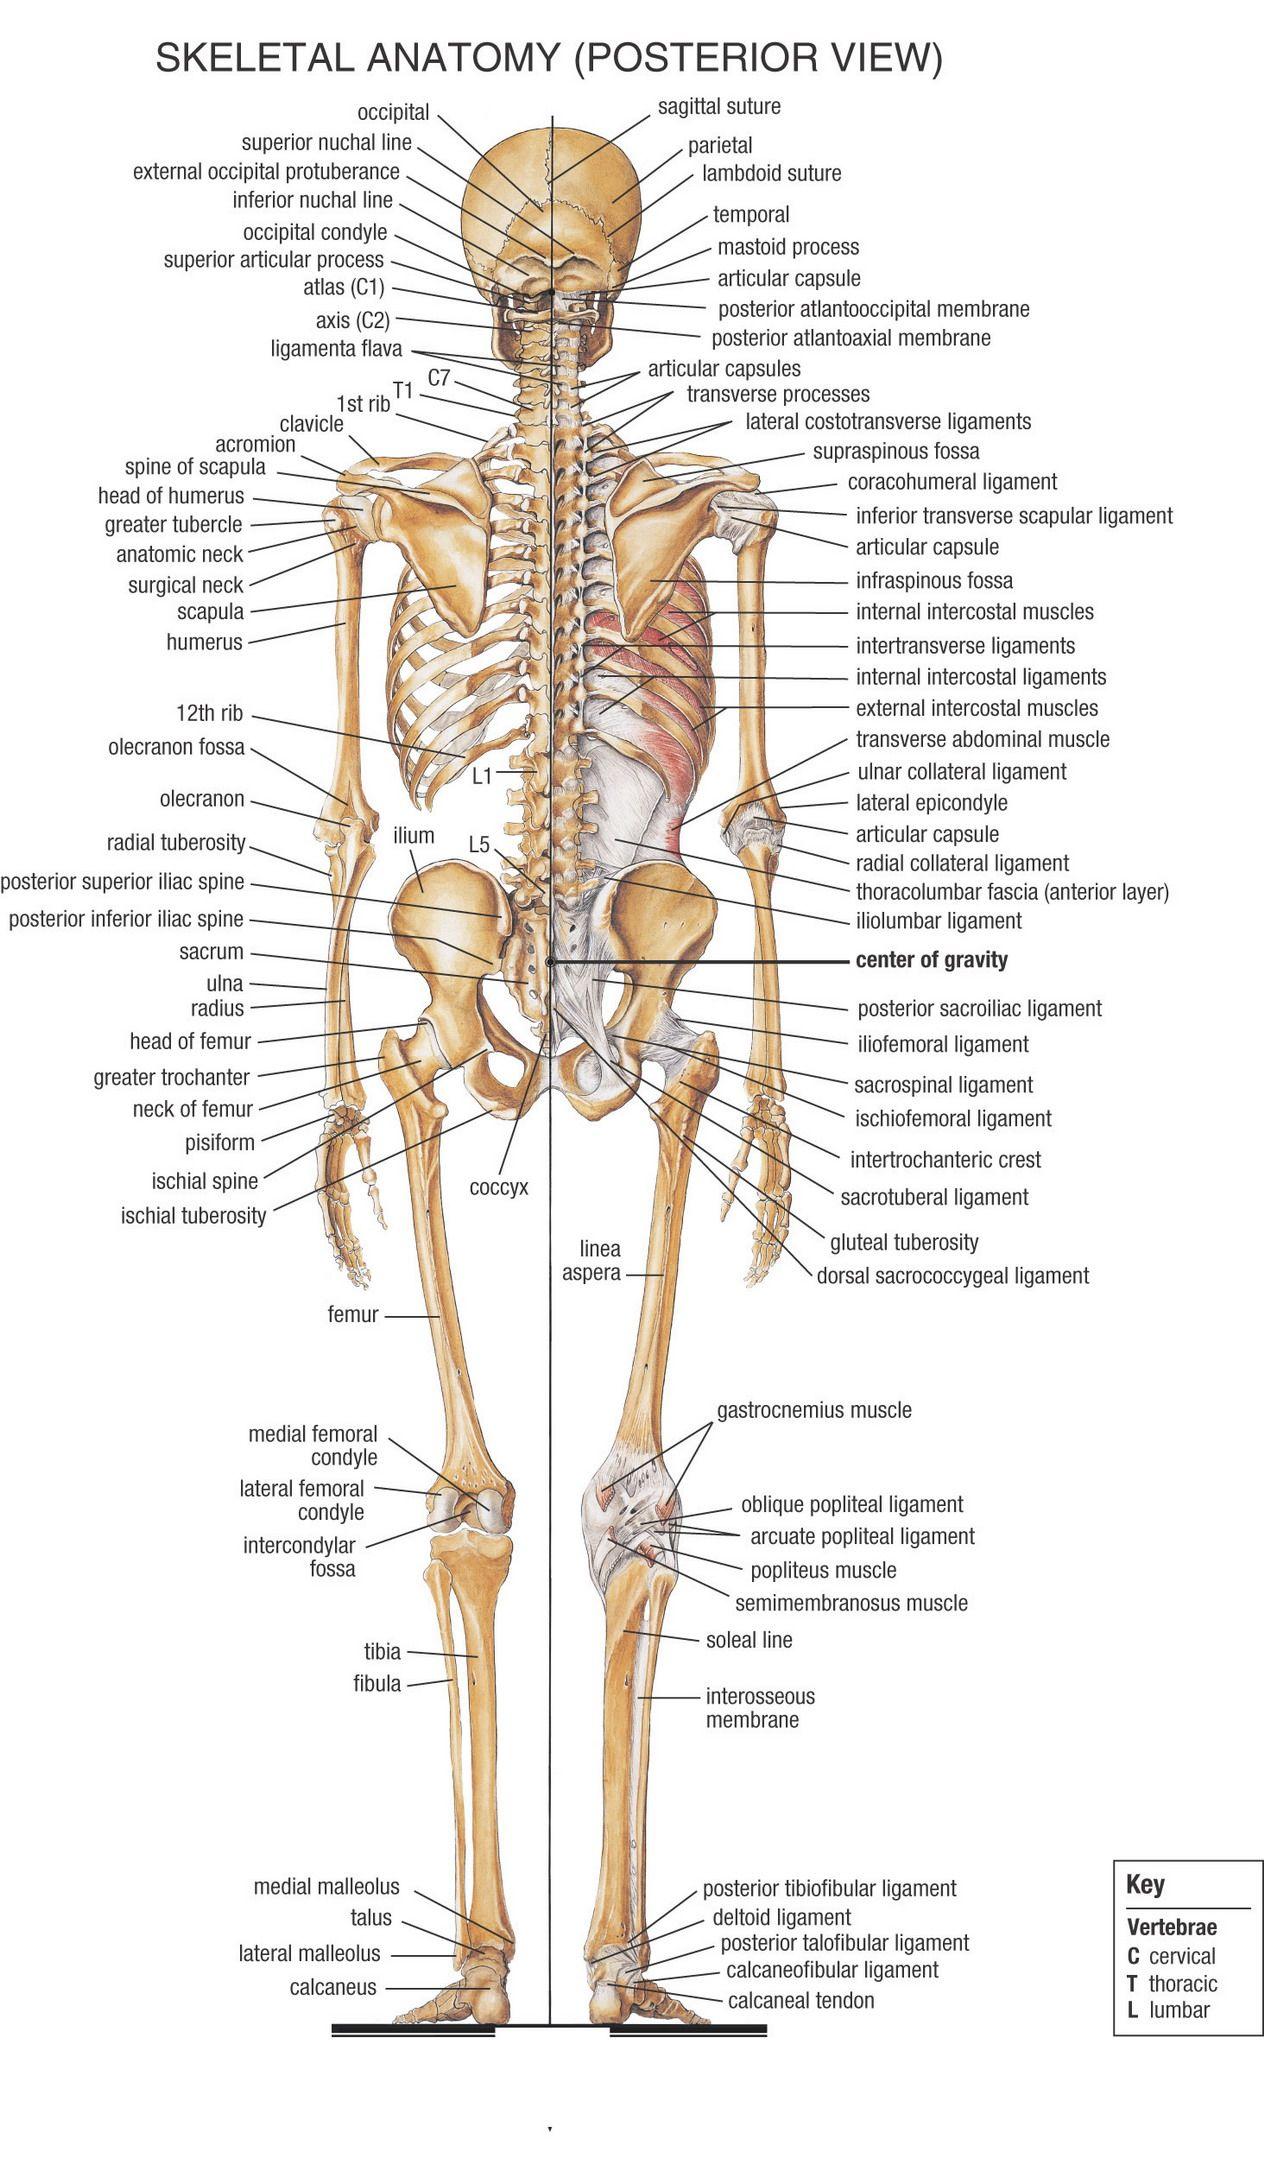 posterior view of pelvis 18 skeletal anatomy [ 1264 x 2165 Pixel ]